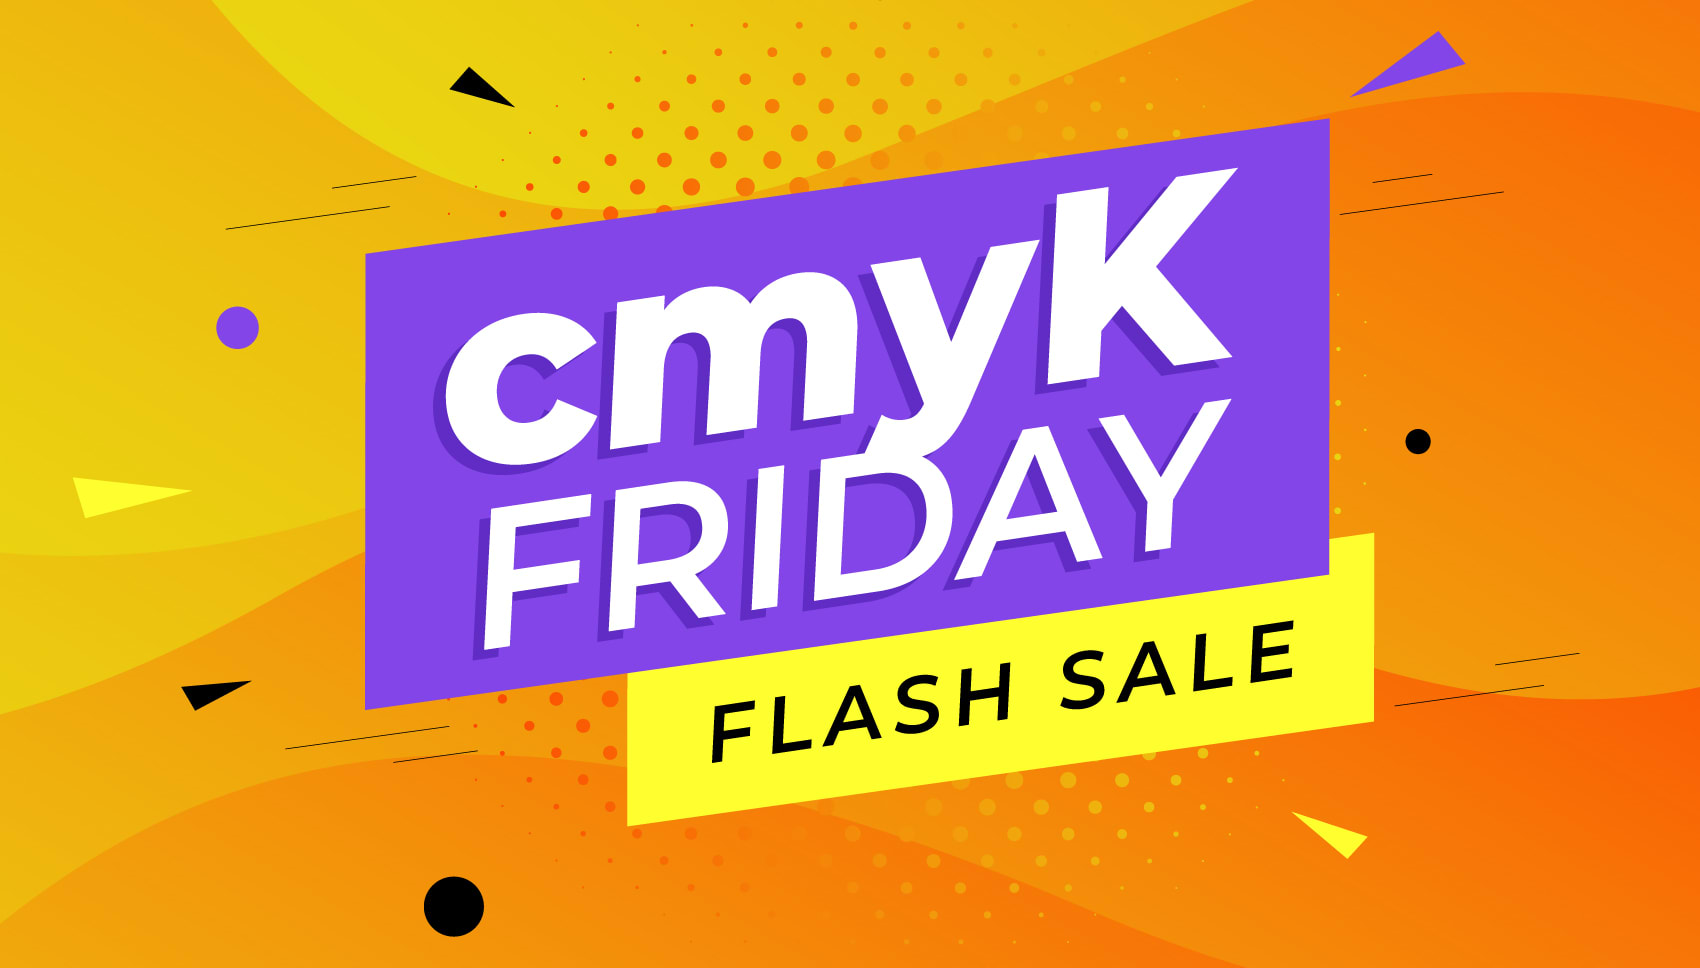 cmyK Friday Flash Sale